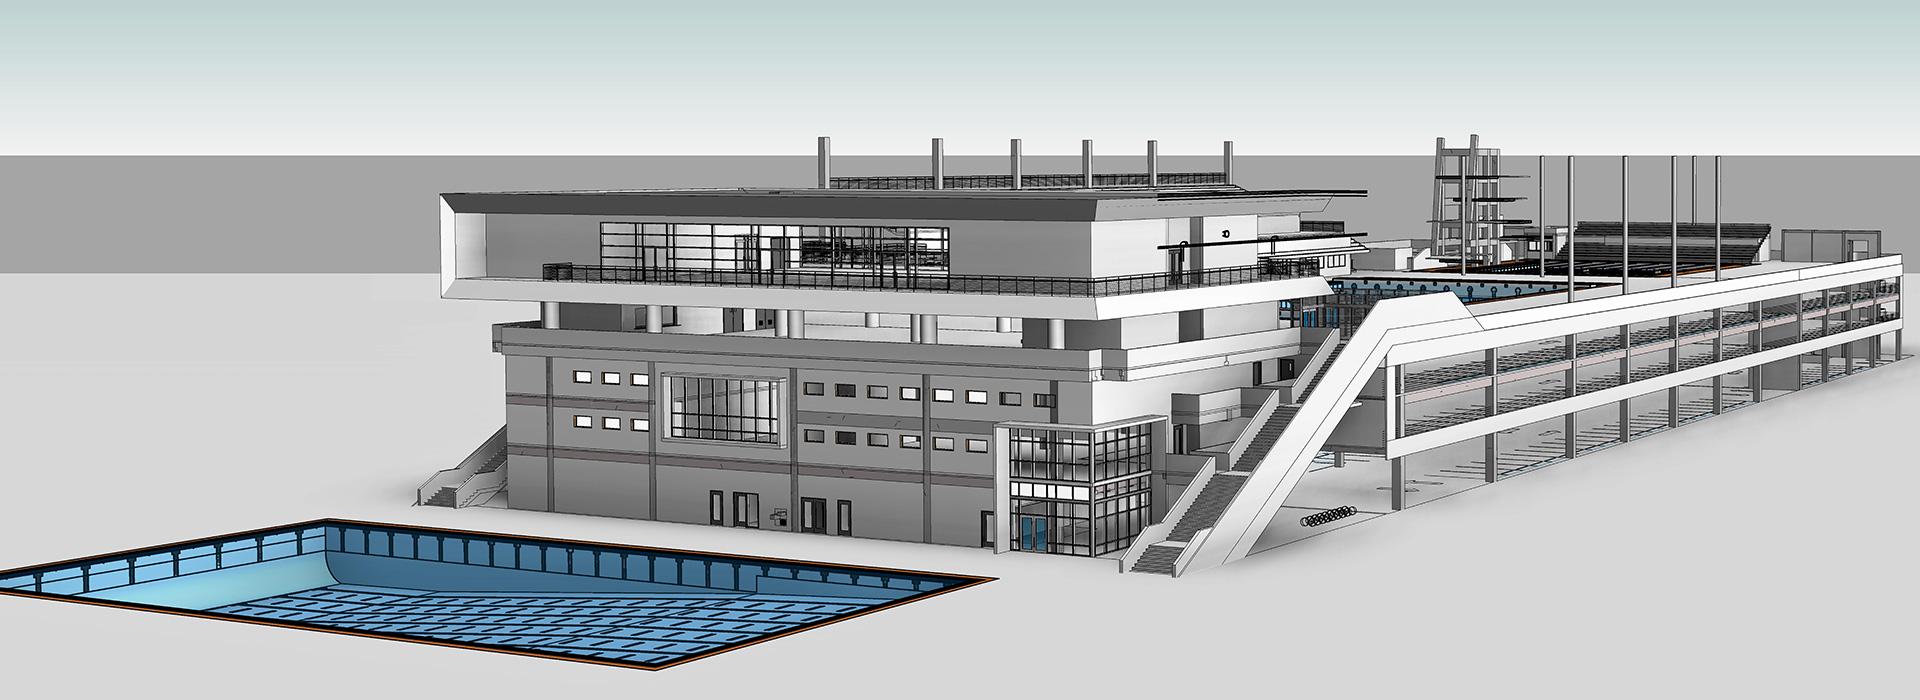 Revit--3D-Architectural-BIM-Model-Commercial-Modeling-by-United-BIM